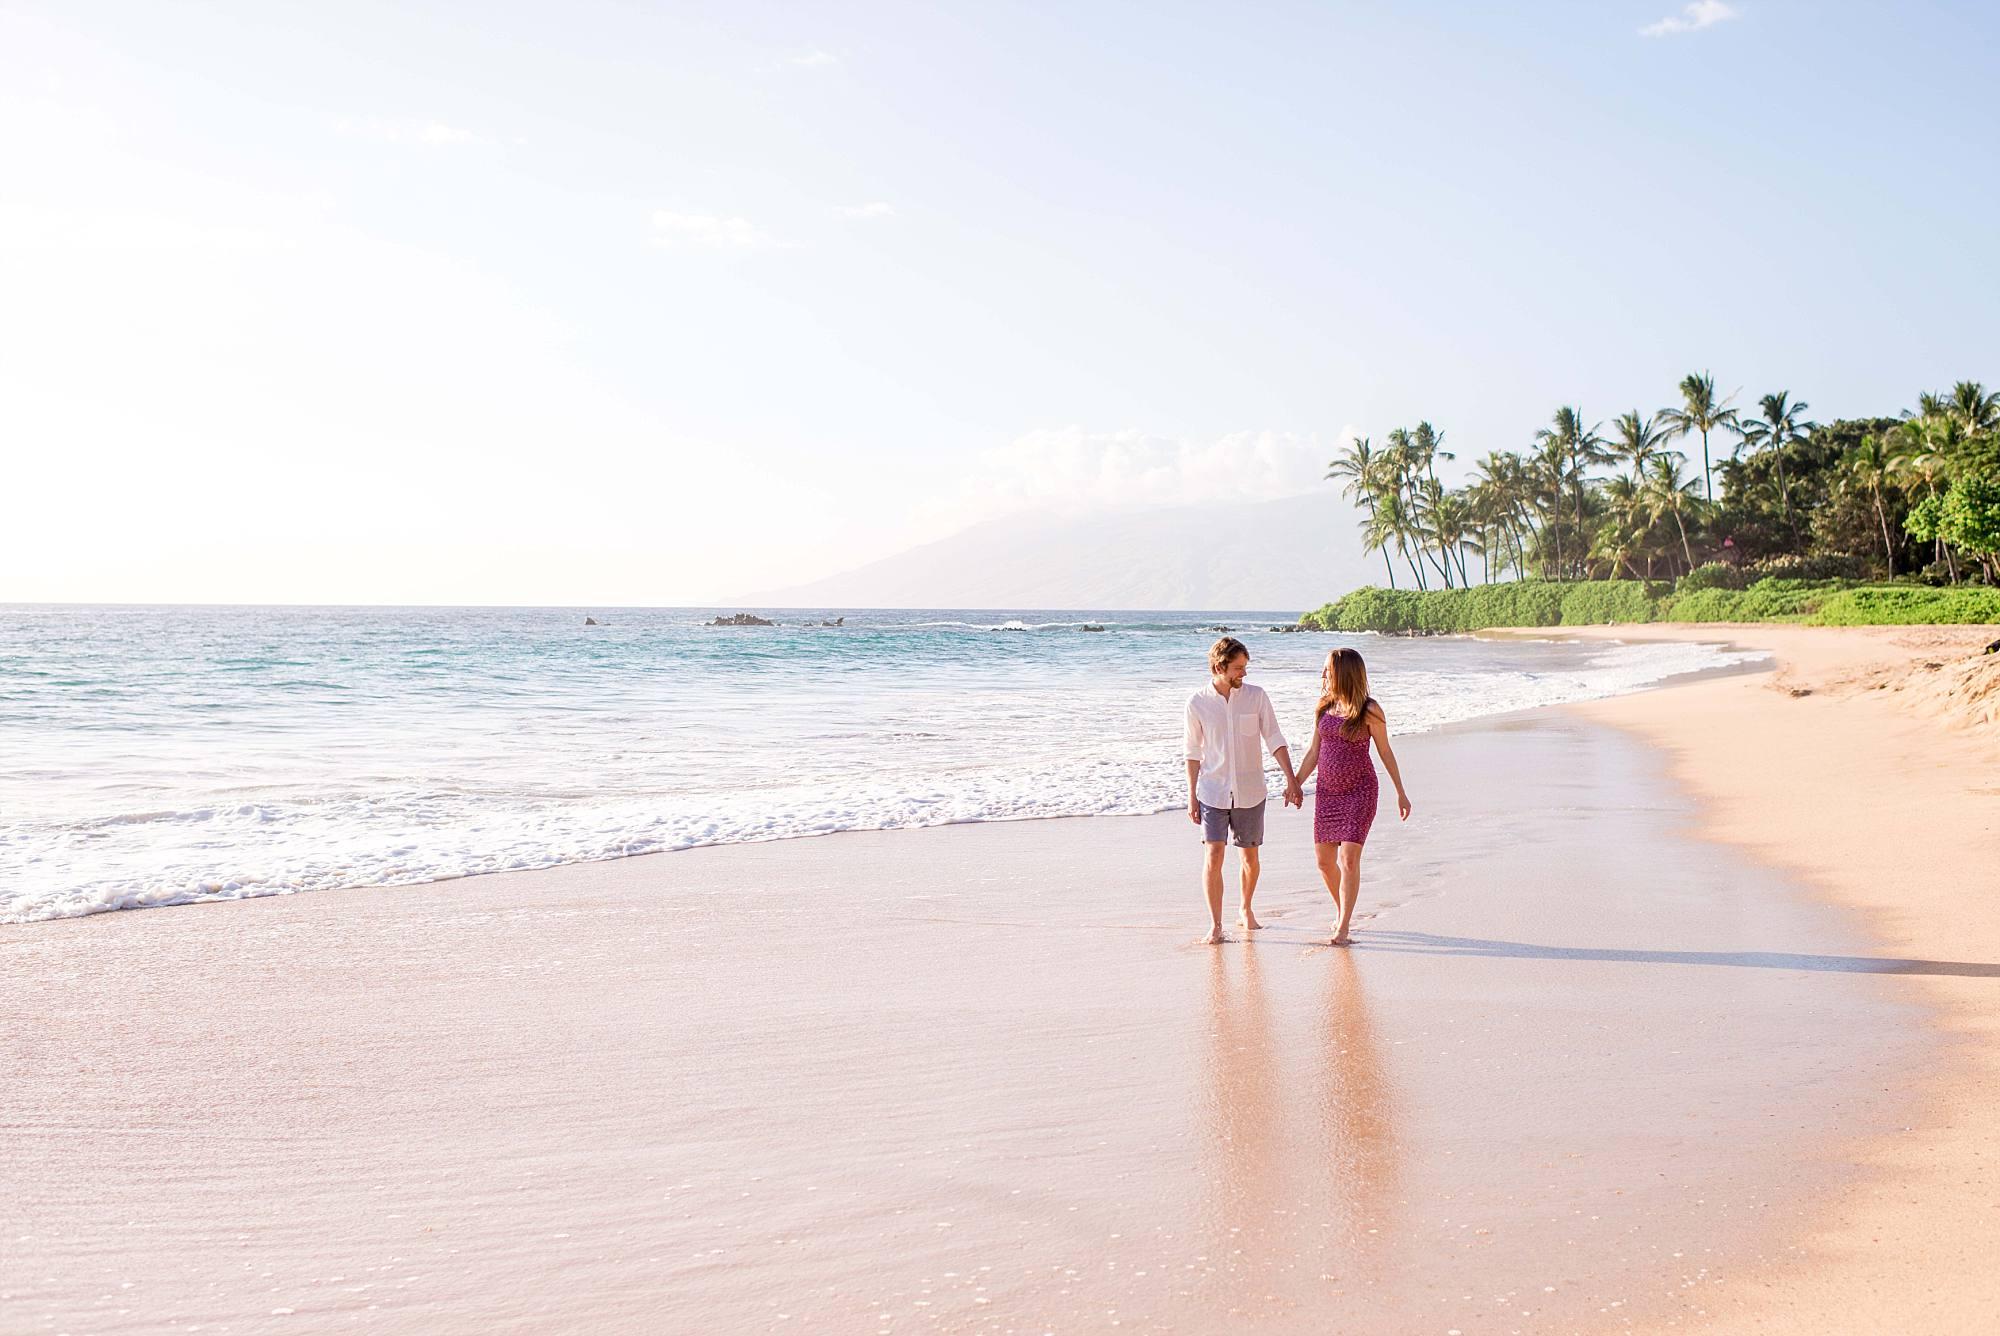 baby moon couple walking down Maui's white sand beach